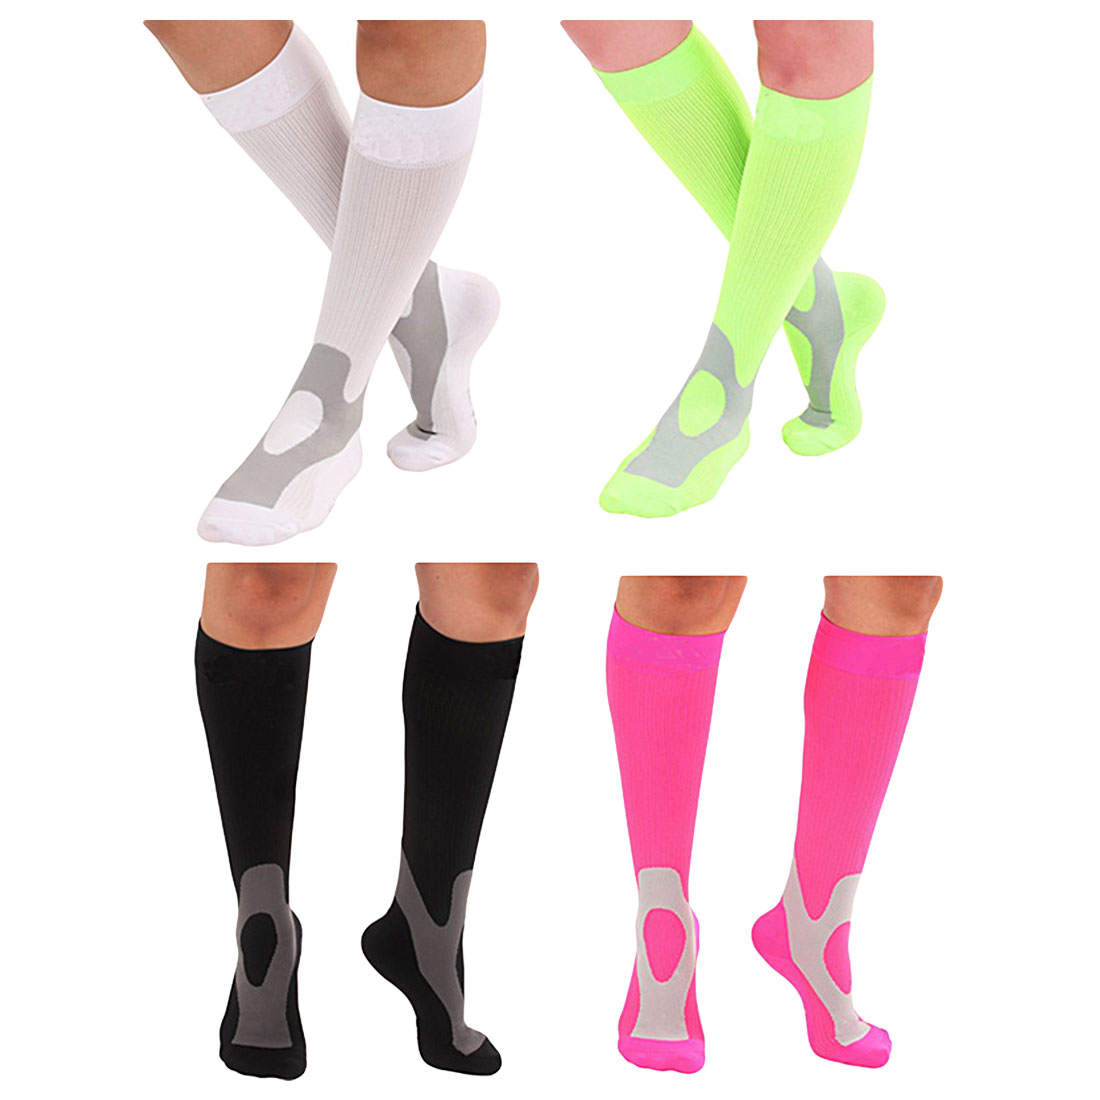 Men Women Breathable Compression Sport Socks Comfortable Relief Soft Leg Support Stretch Sock